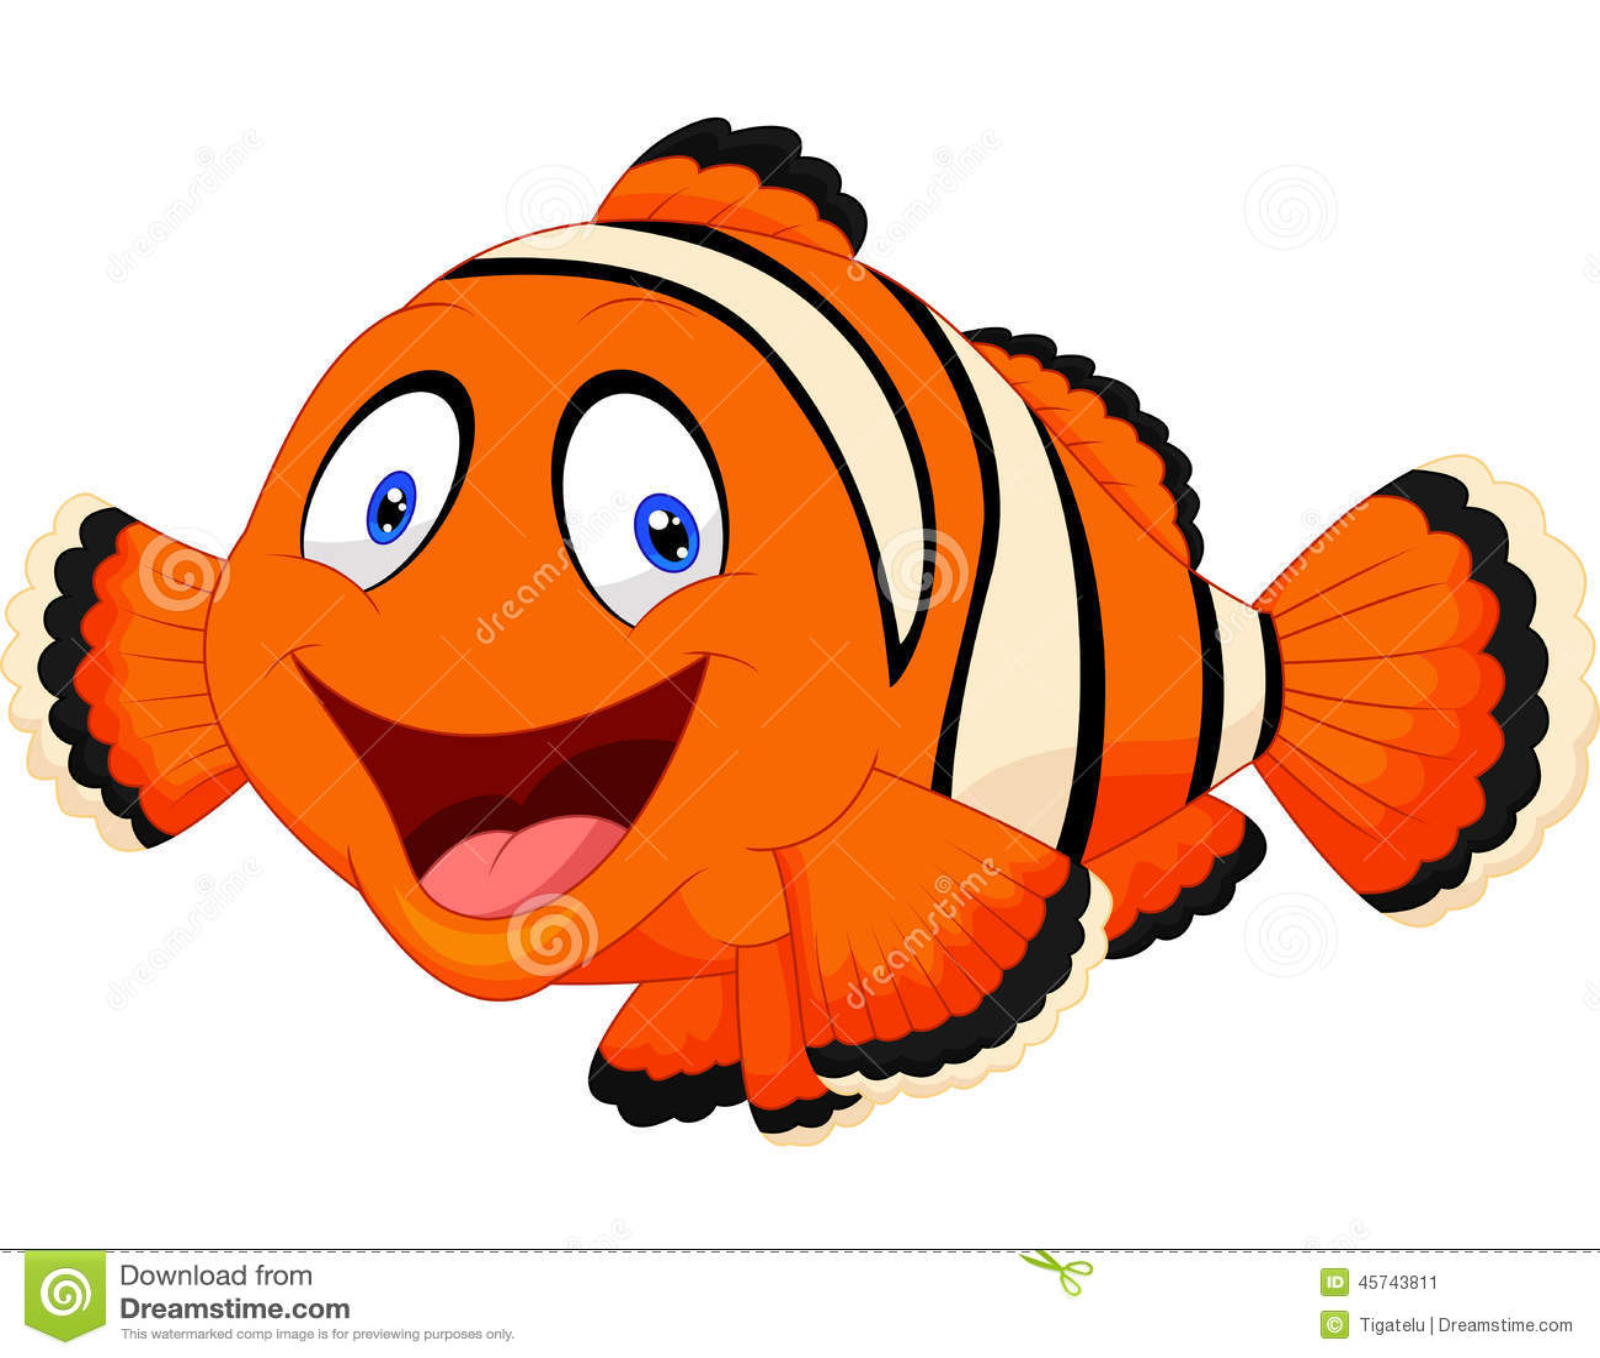 cute clown fish cartoon stock vector illustration of wildlife